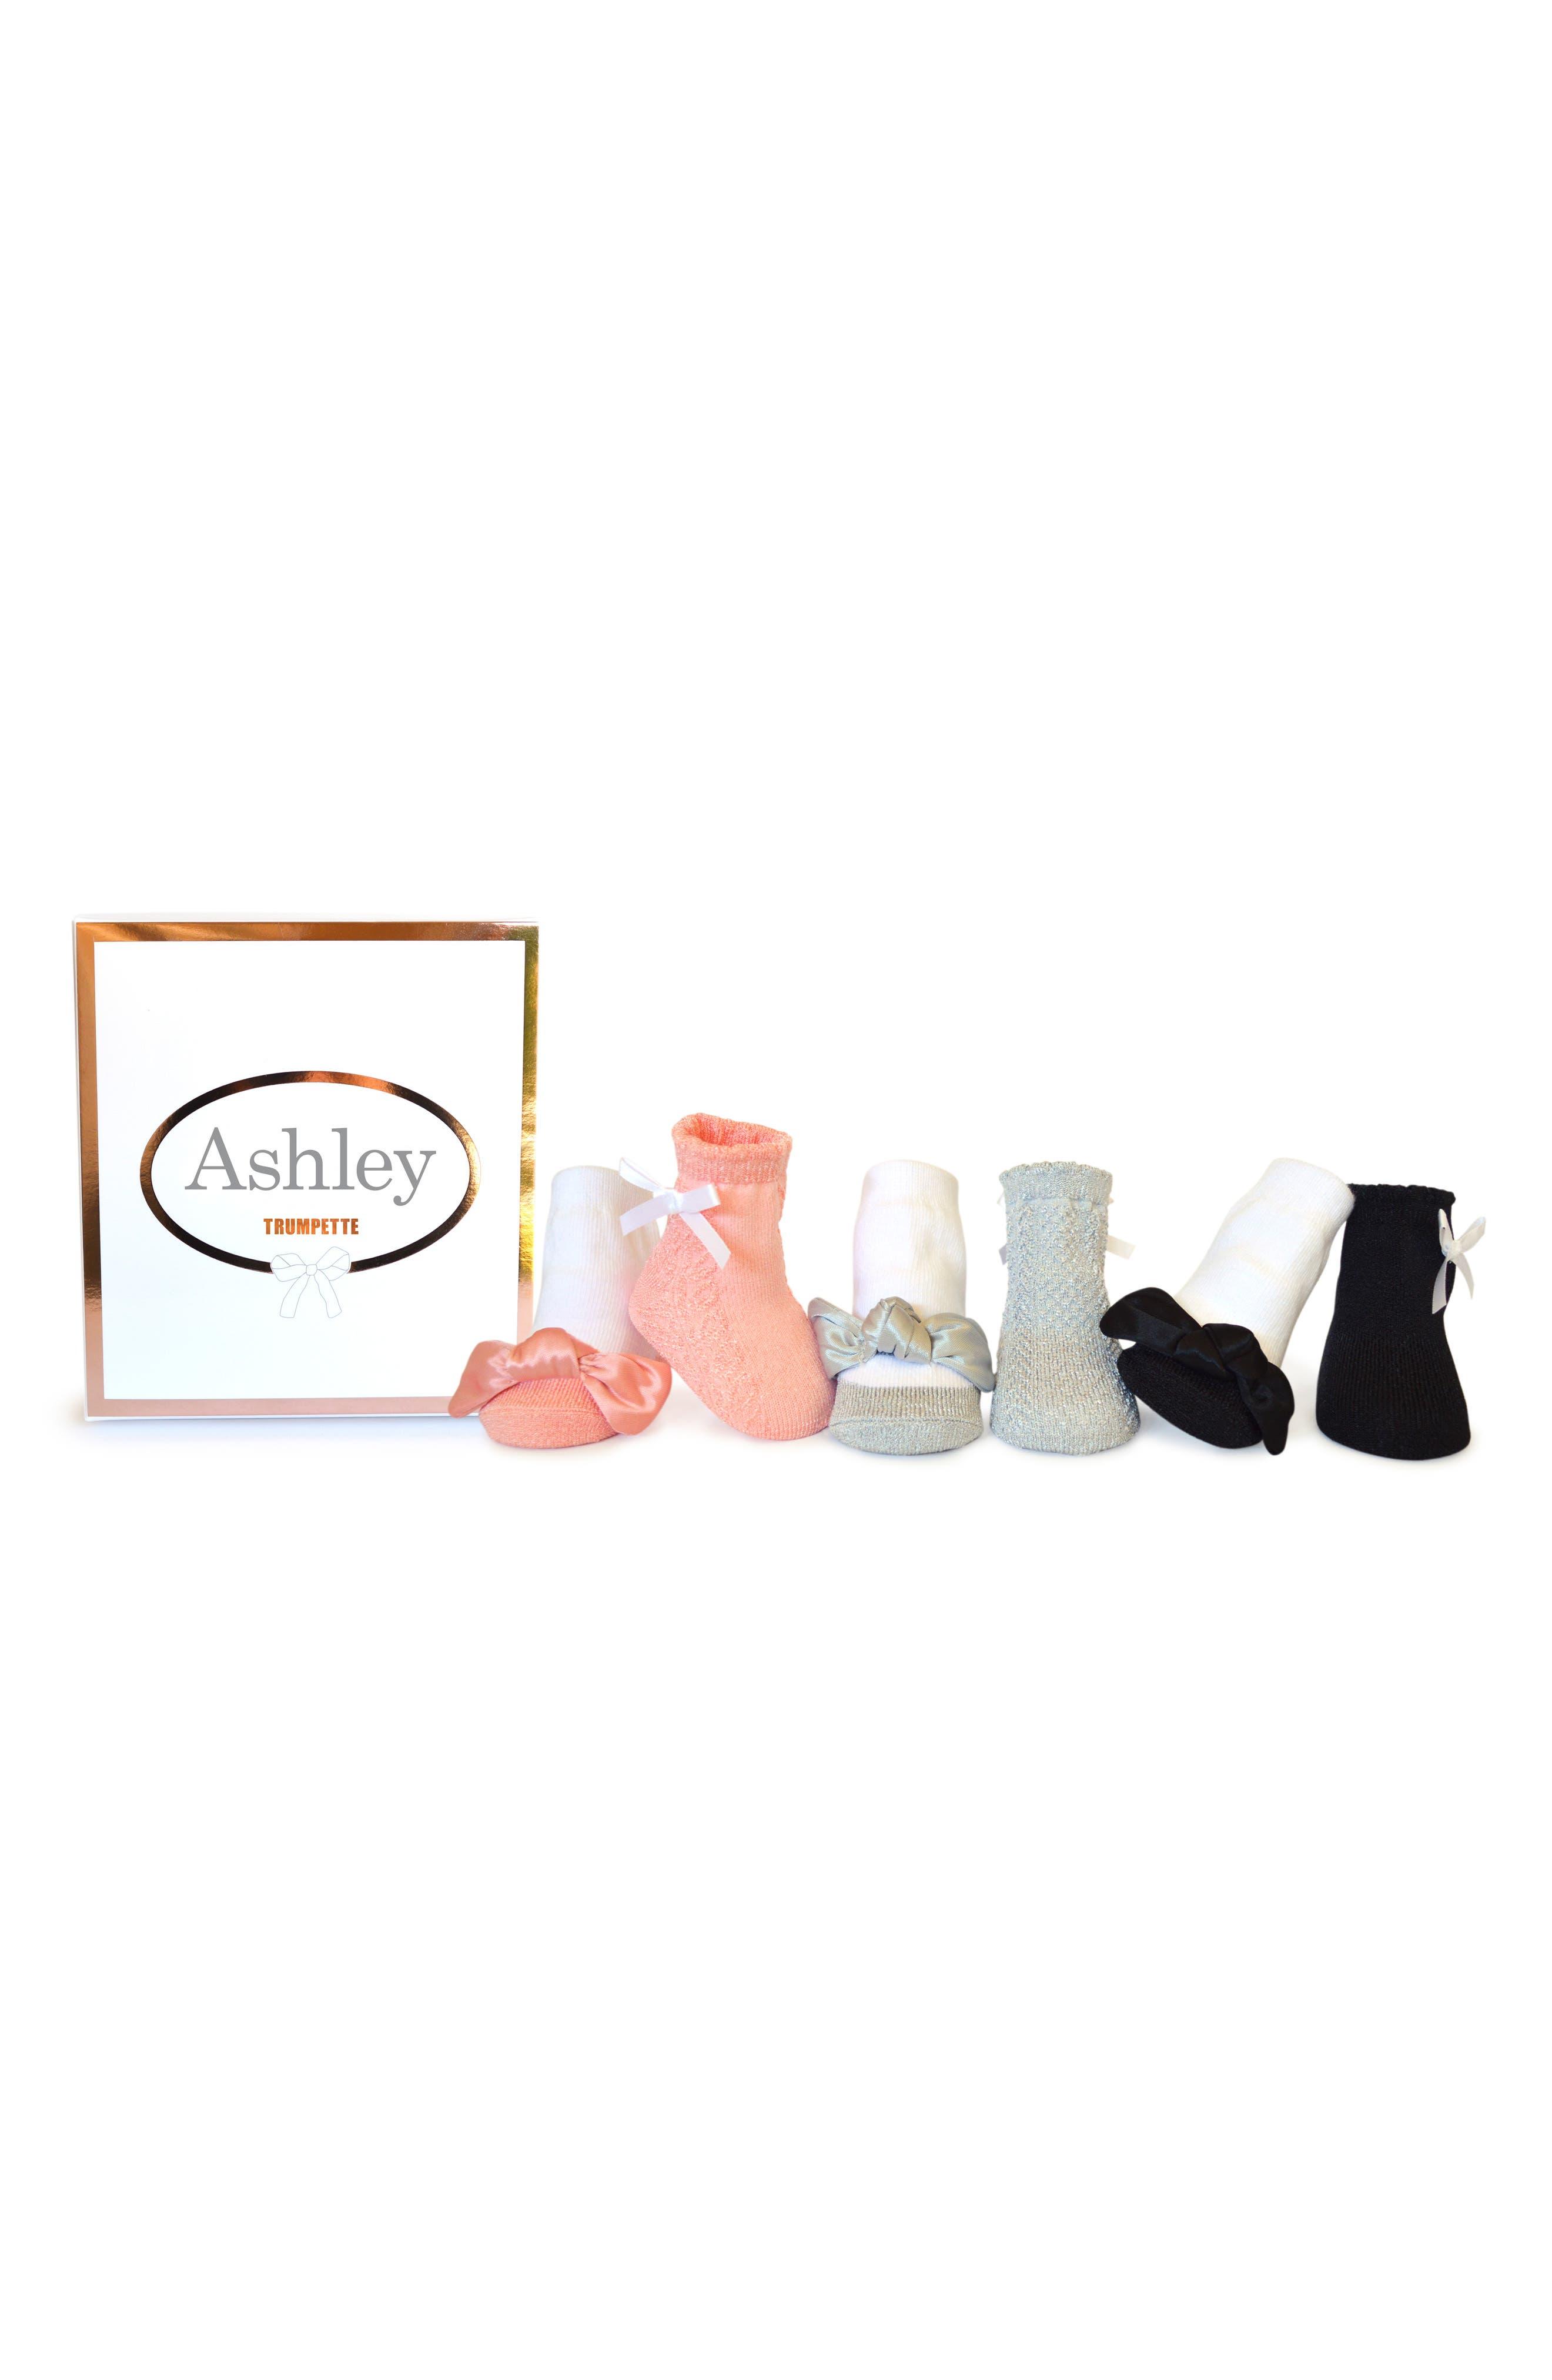 Ashley 6-Pack Socks,                             Main thumbnail 1, color,                             ASSORTED PASTEL